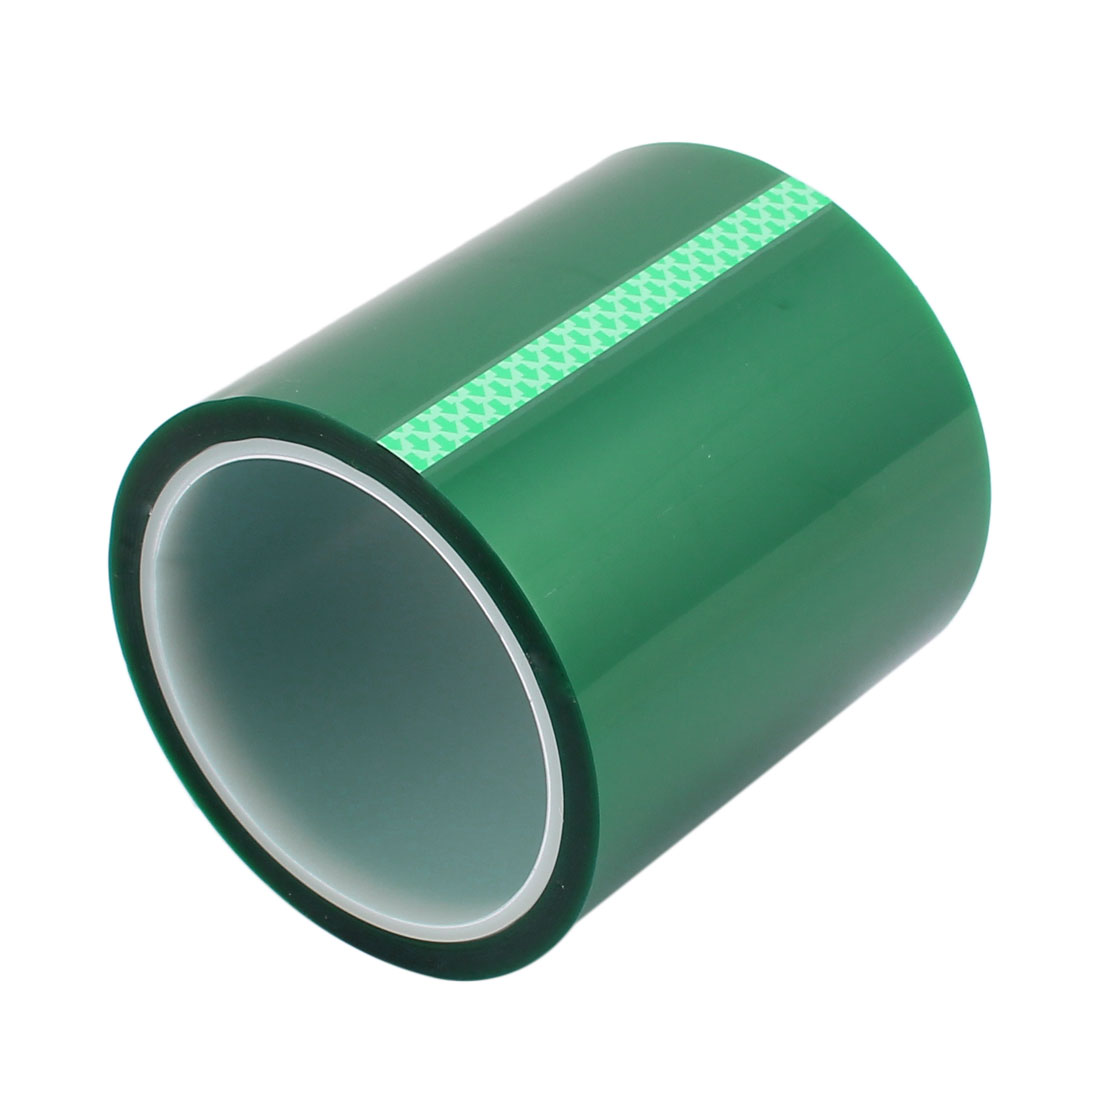 100mm Width 33M Length Green PET Adhesive Tape High Temp Heat Resistant Solder